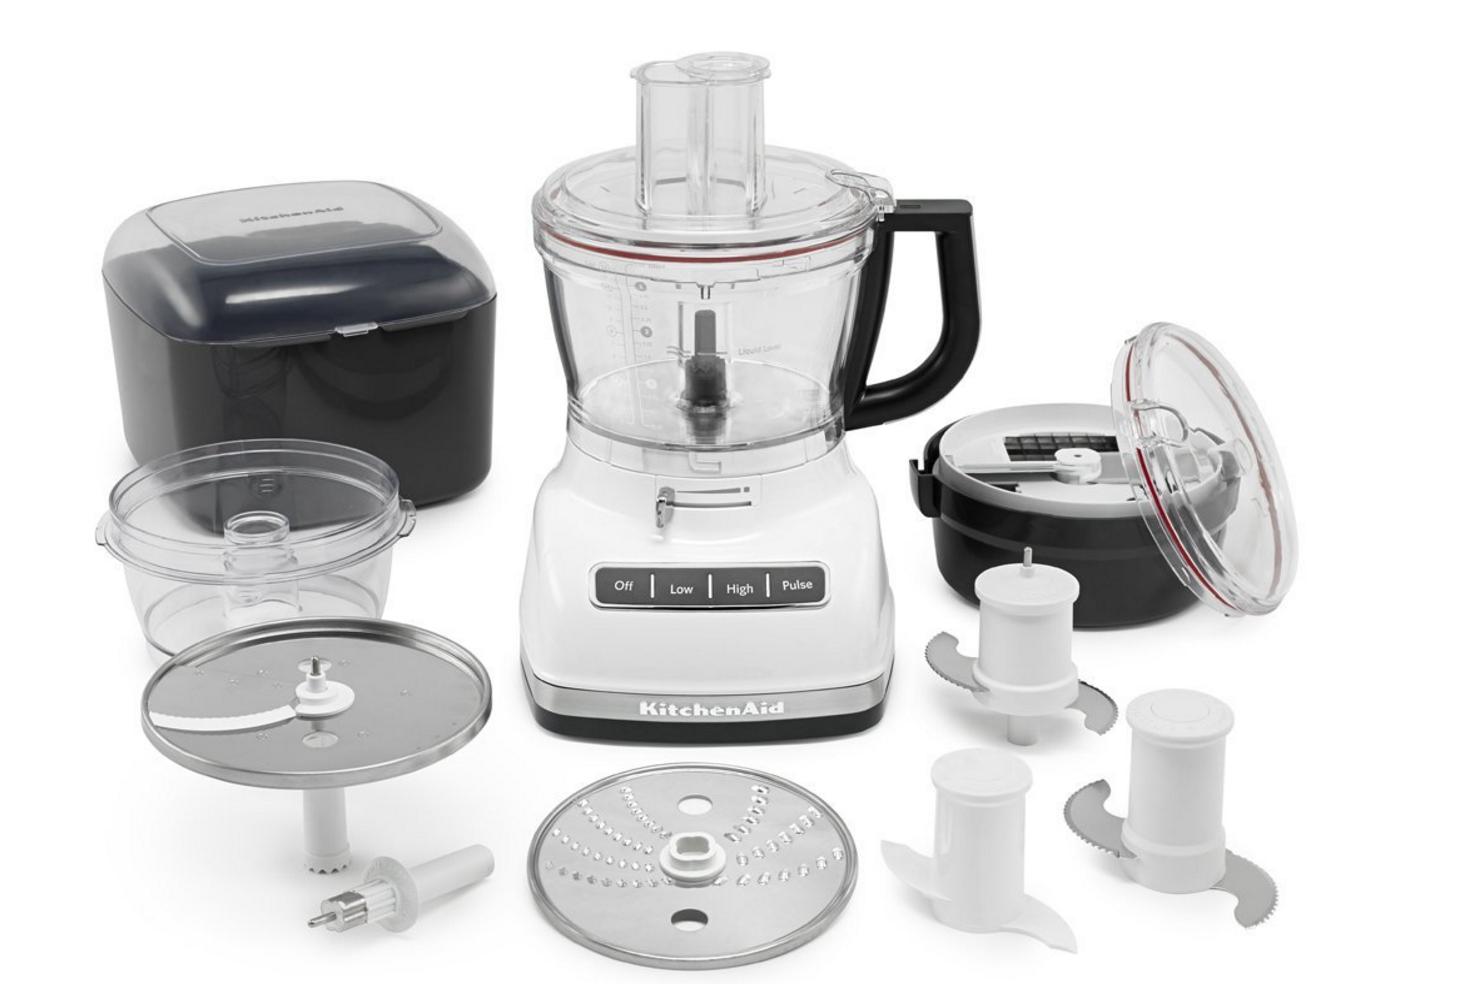 Kitchenaid 14 Cup Food Processor Only 249 99 Reg 399 99